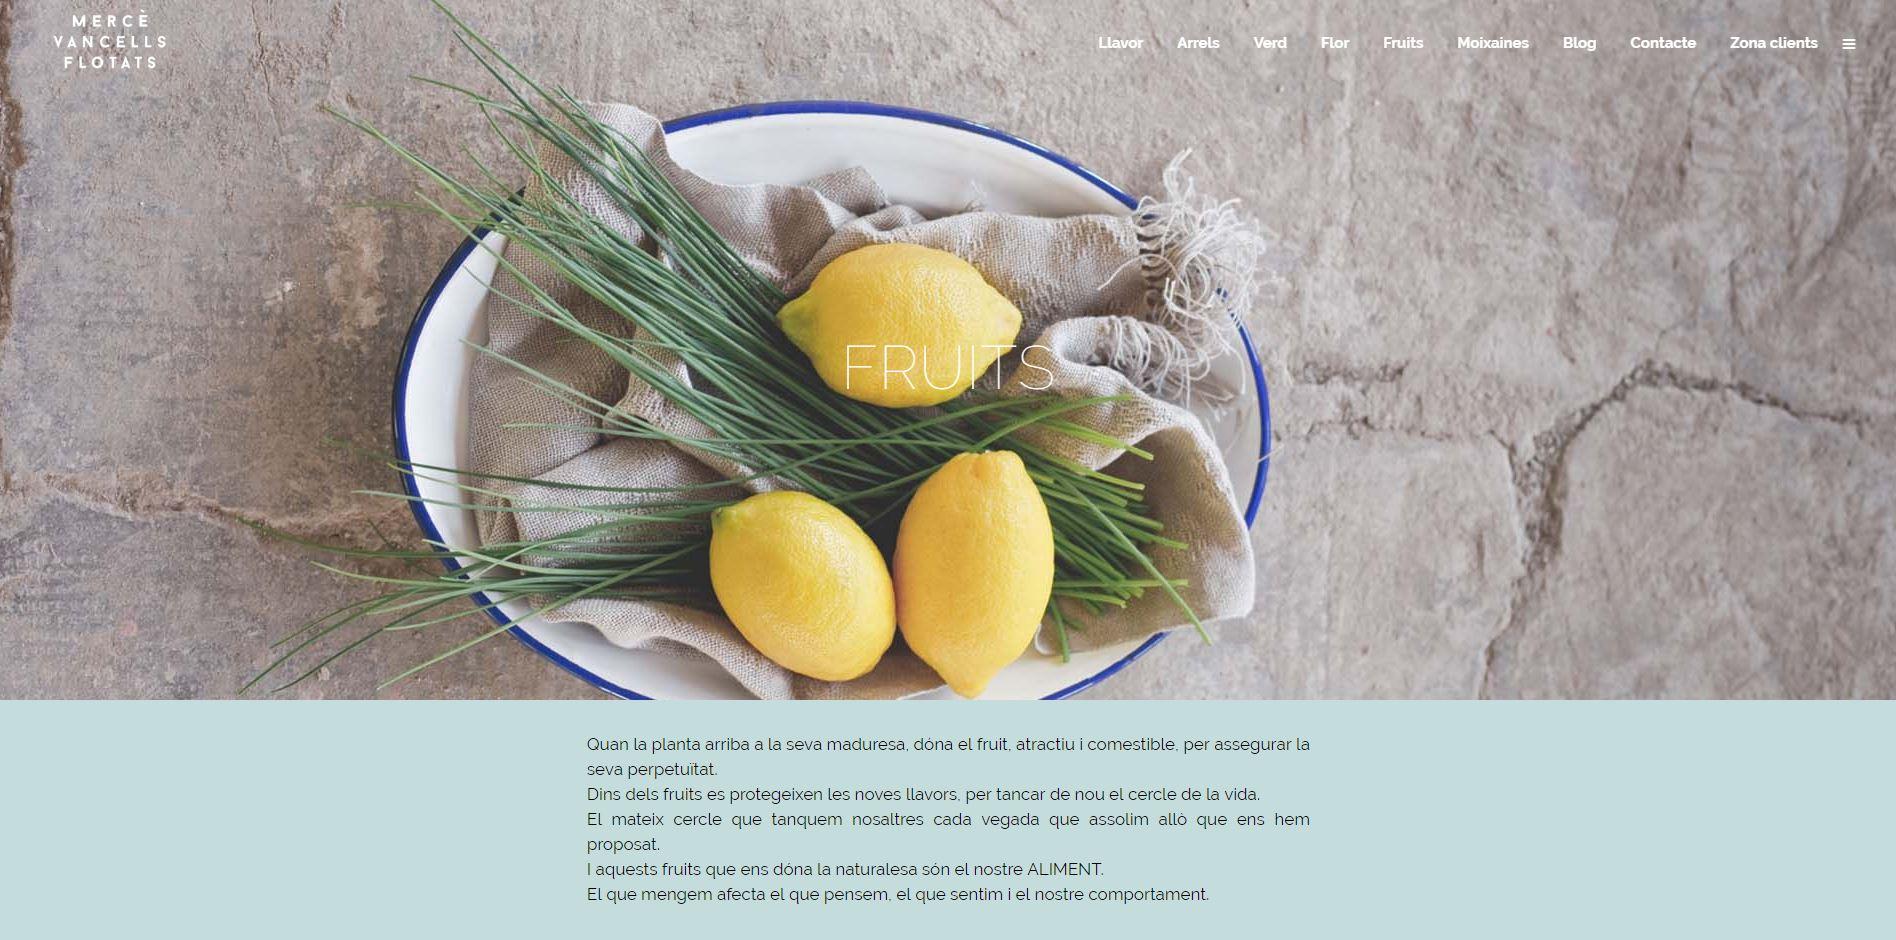 web_mercevancells-fruits